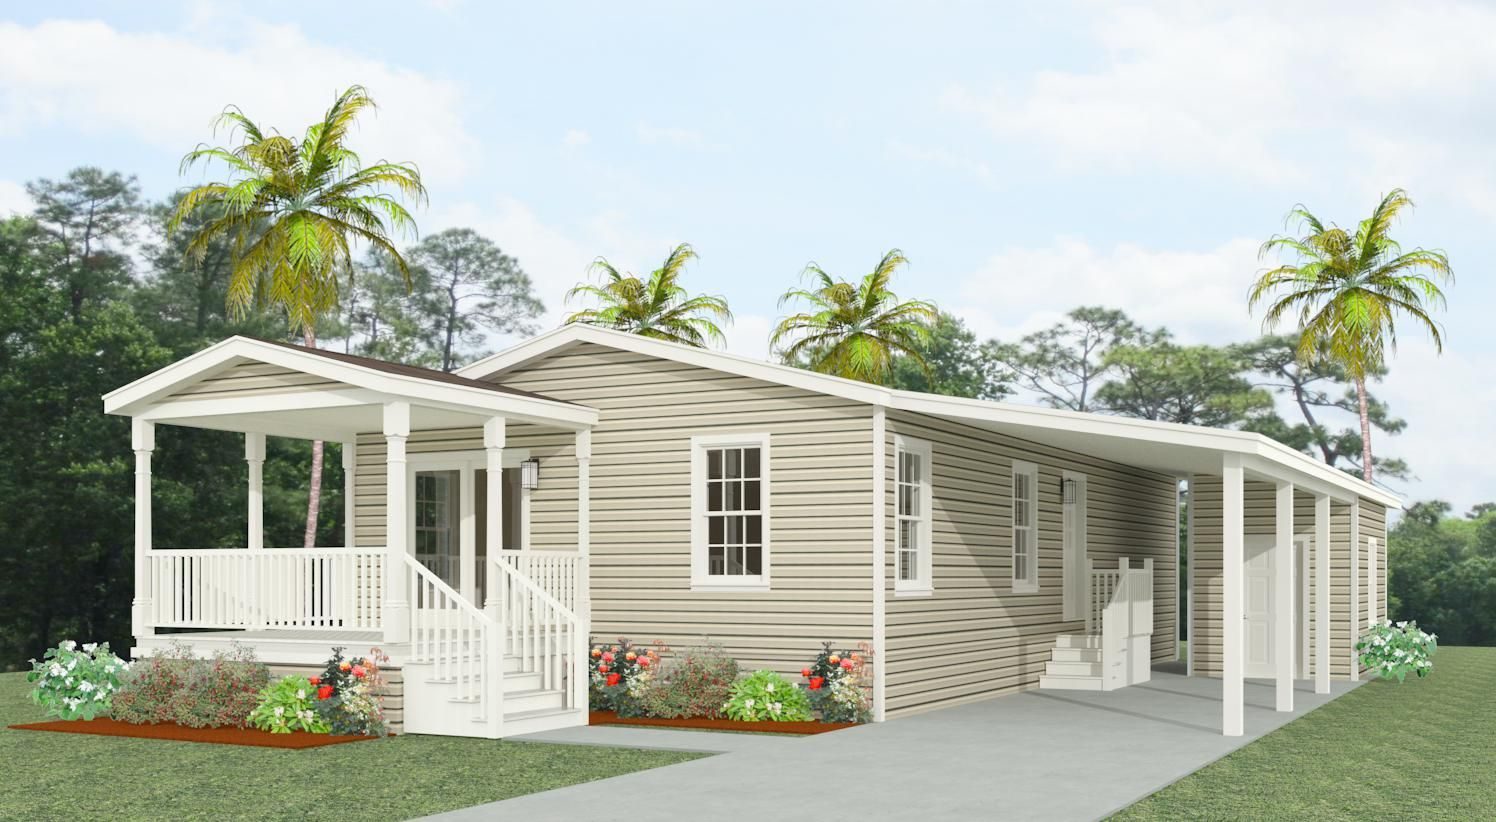 Modular home model center